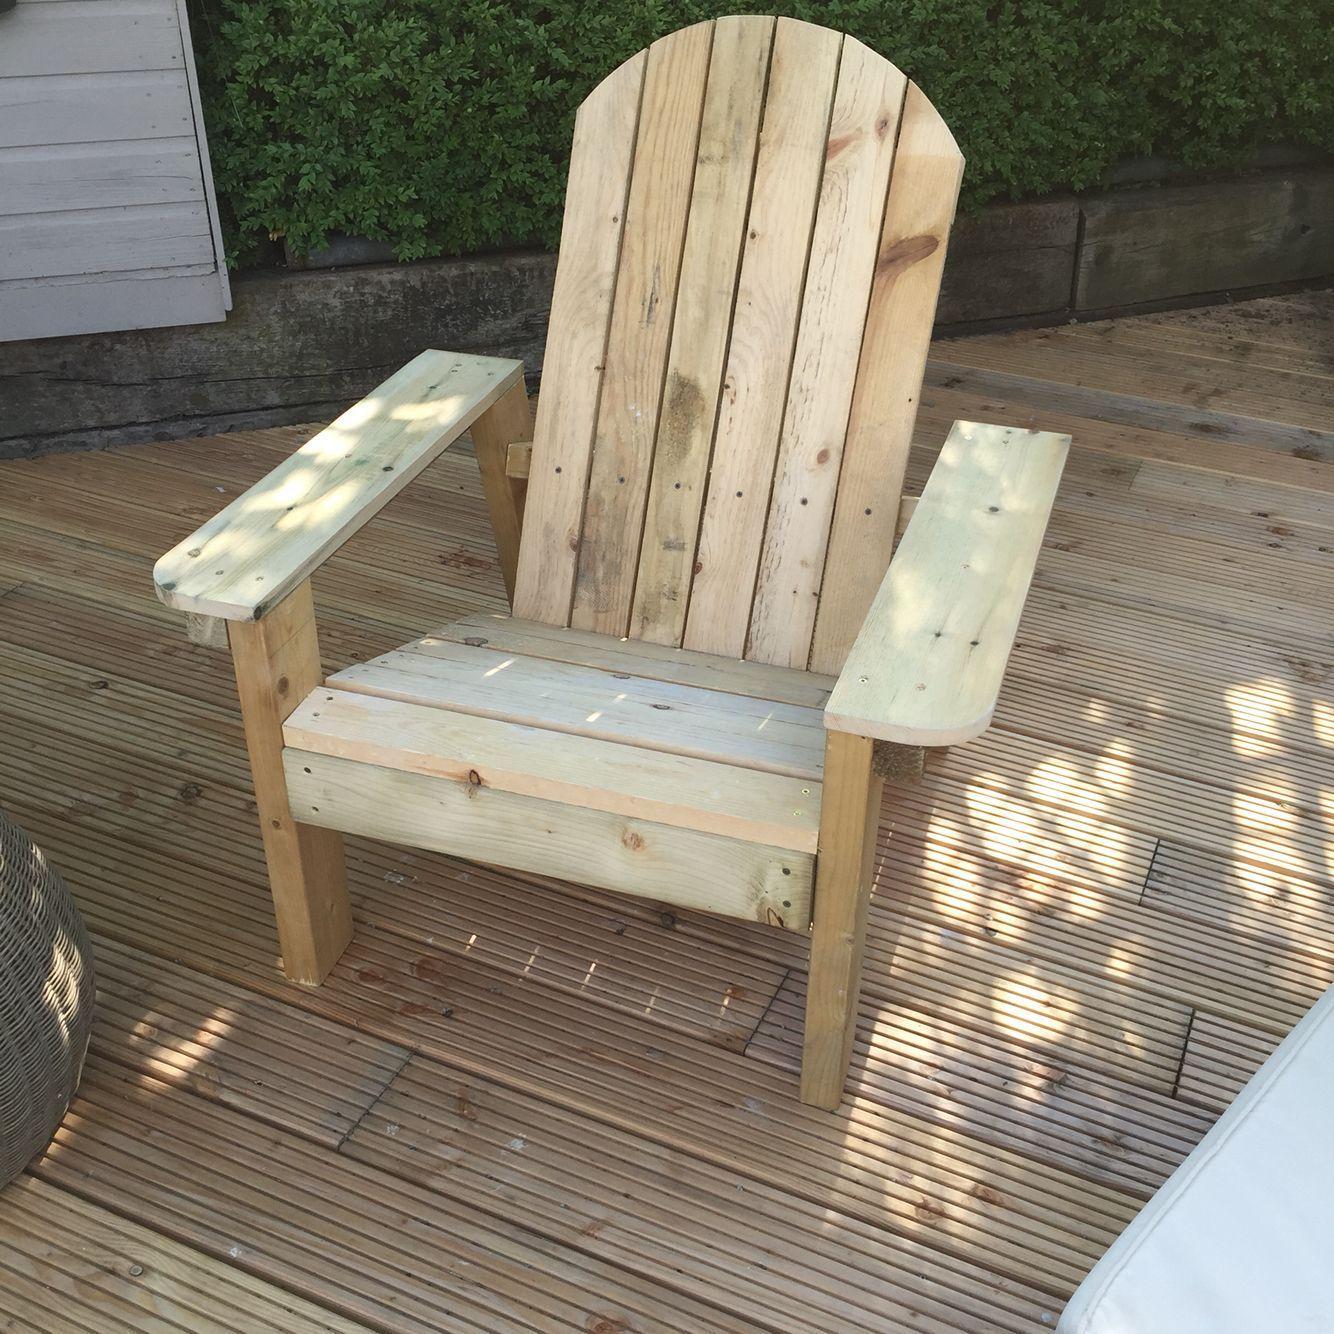 Lovely Wooden Deck Chair Plans Home depot adirondack